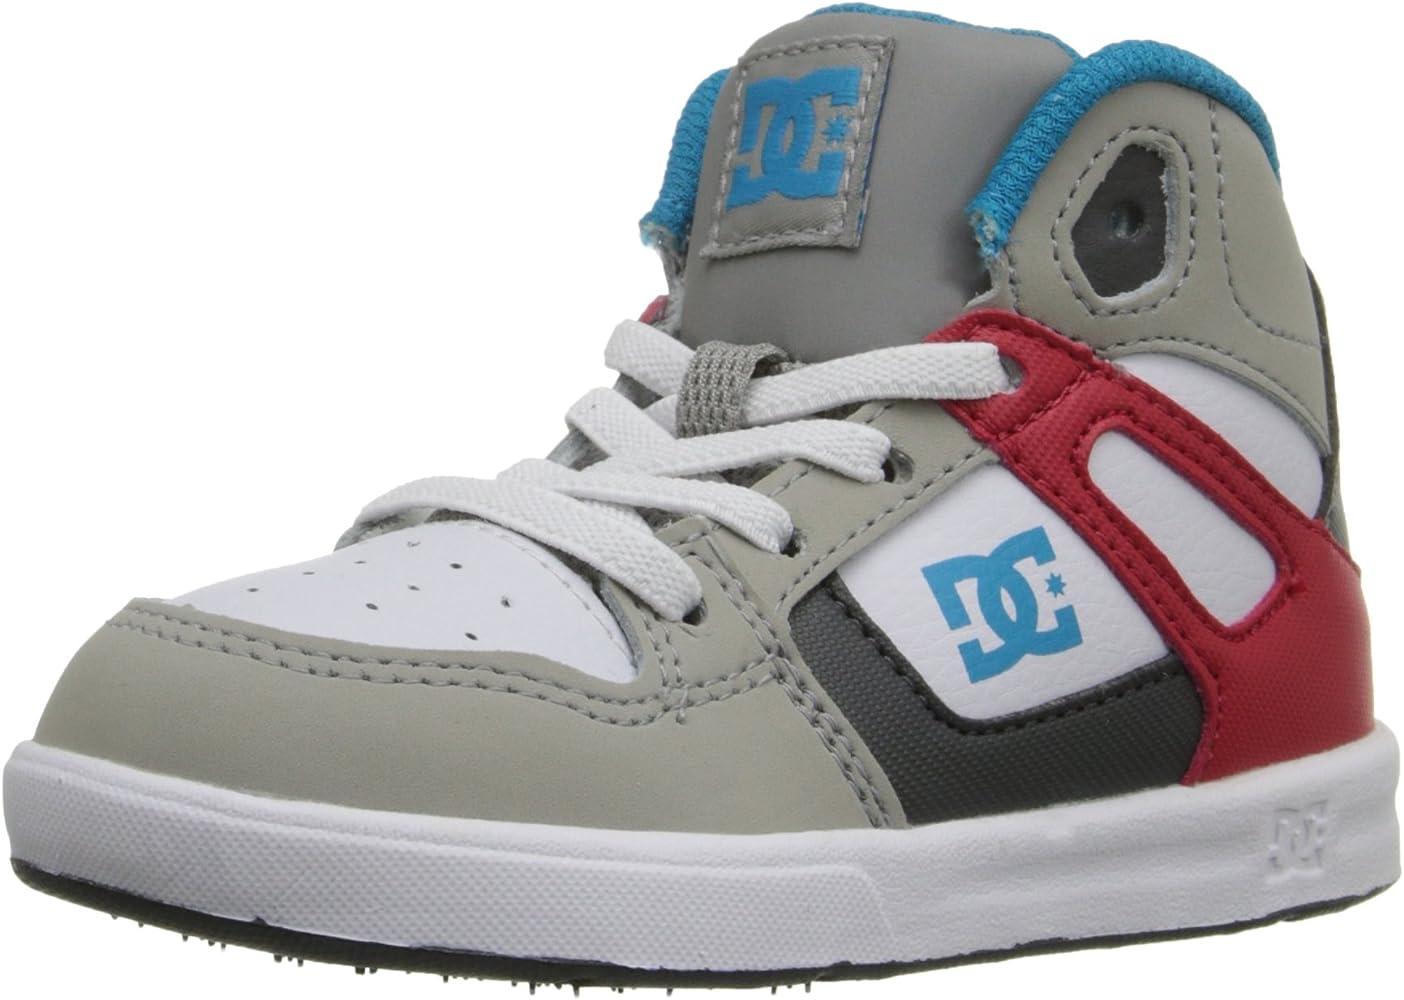 53eba42c26 Shoes Baby-Boys Shoes Rebound Ul - High-Top Shoes - Boys - US 7 - Grey  Grey/Red/White US 7 / UK 6 / EU 23